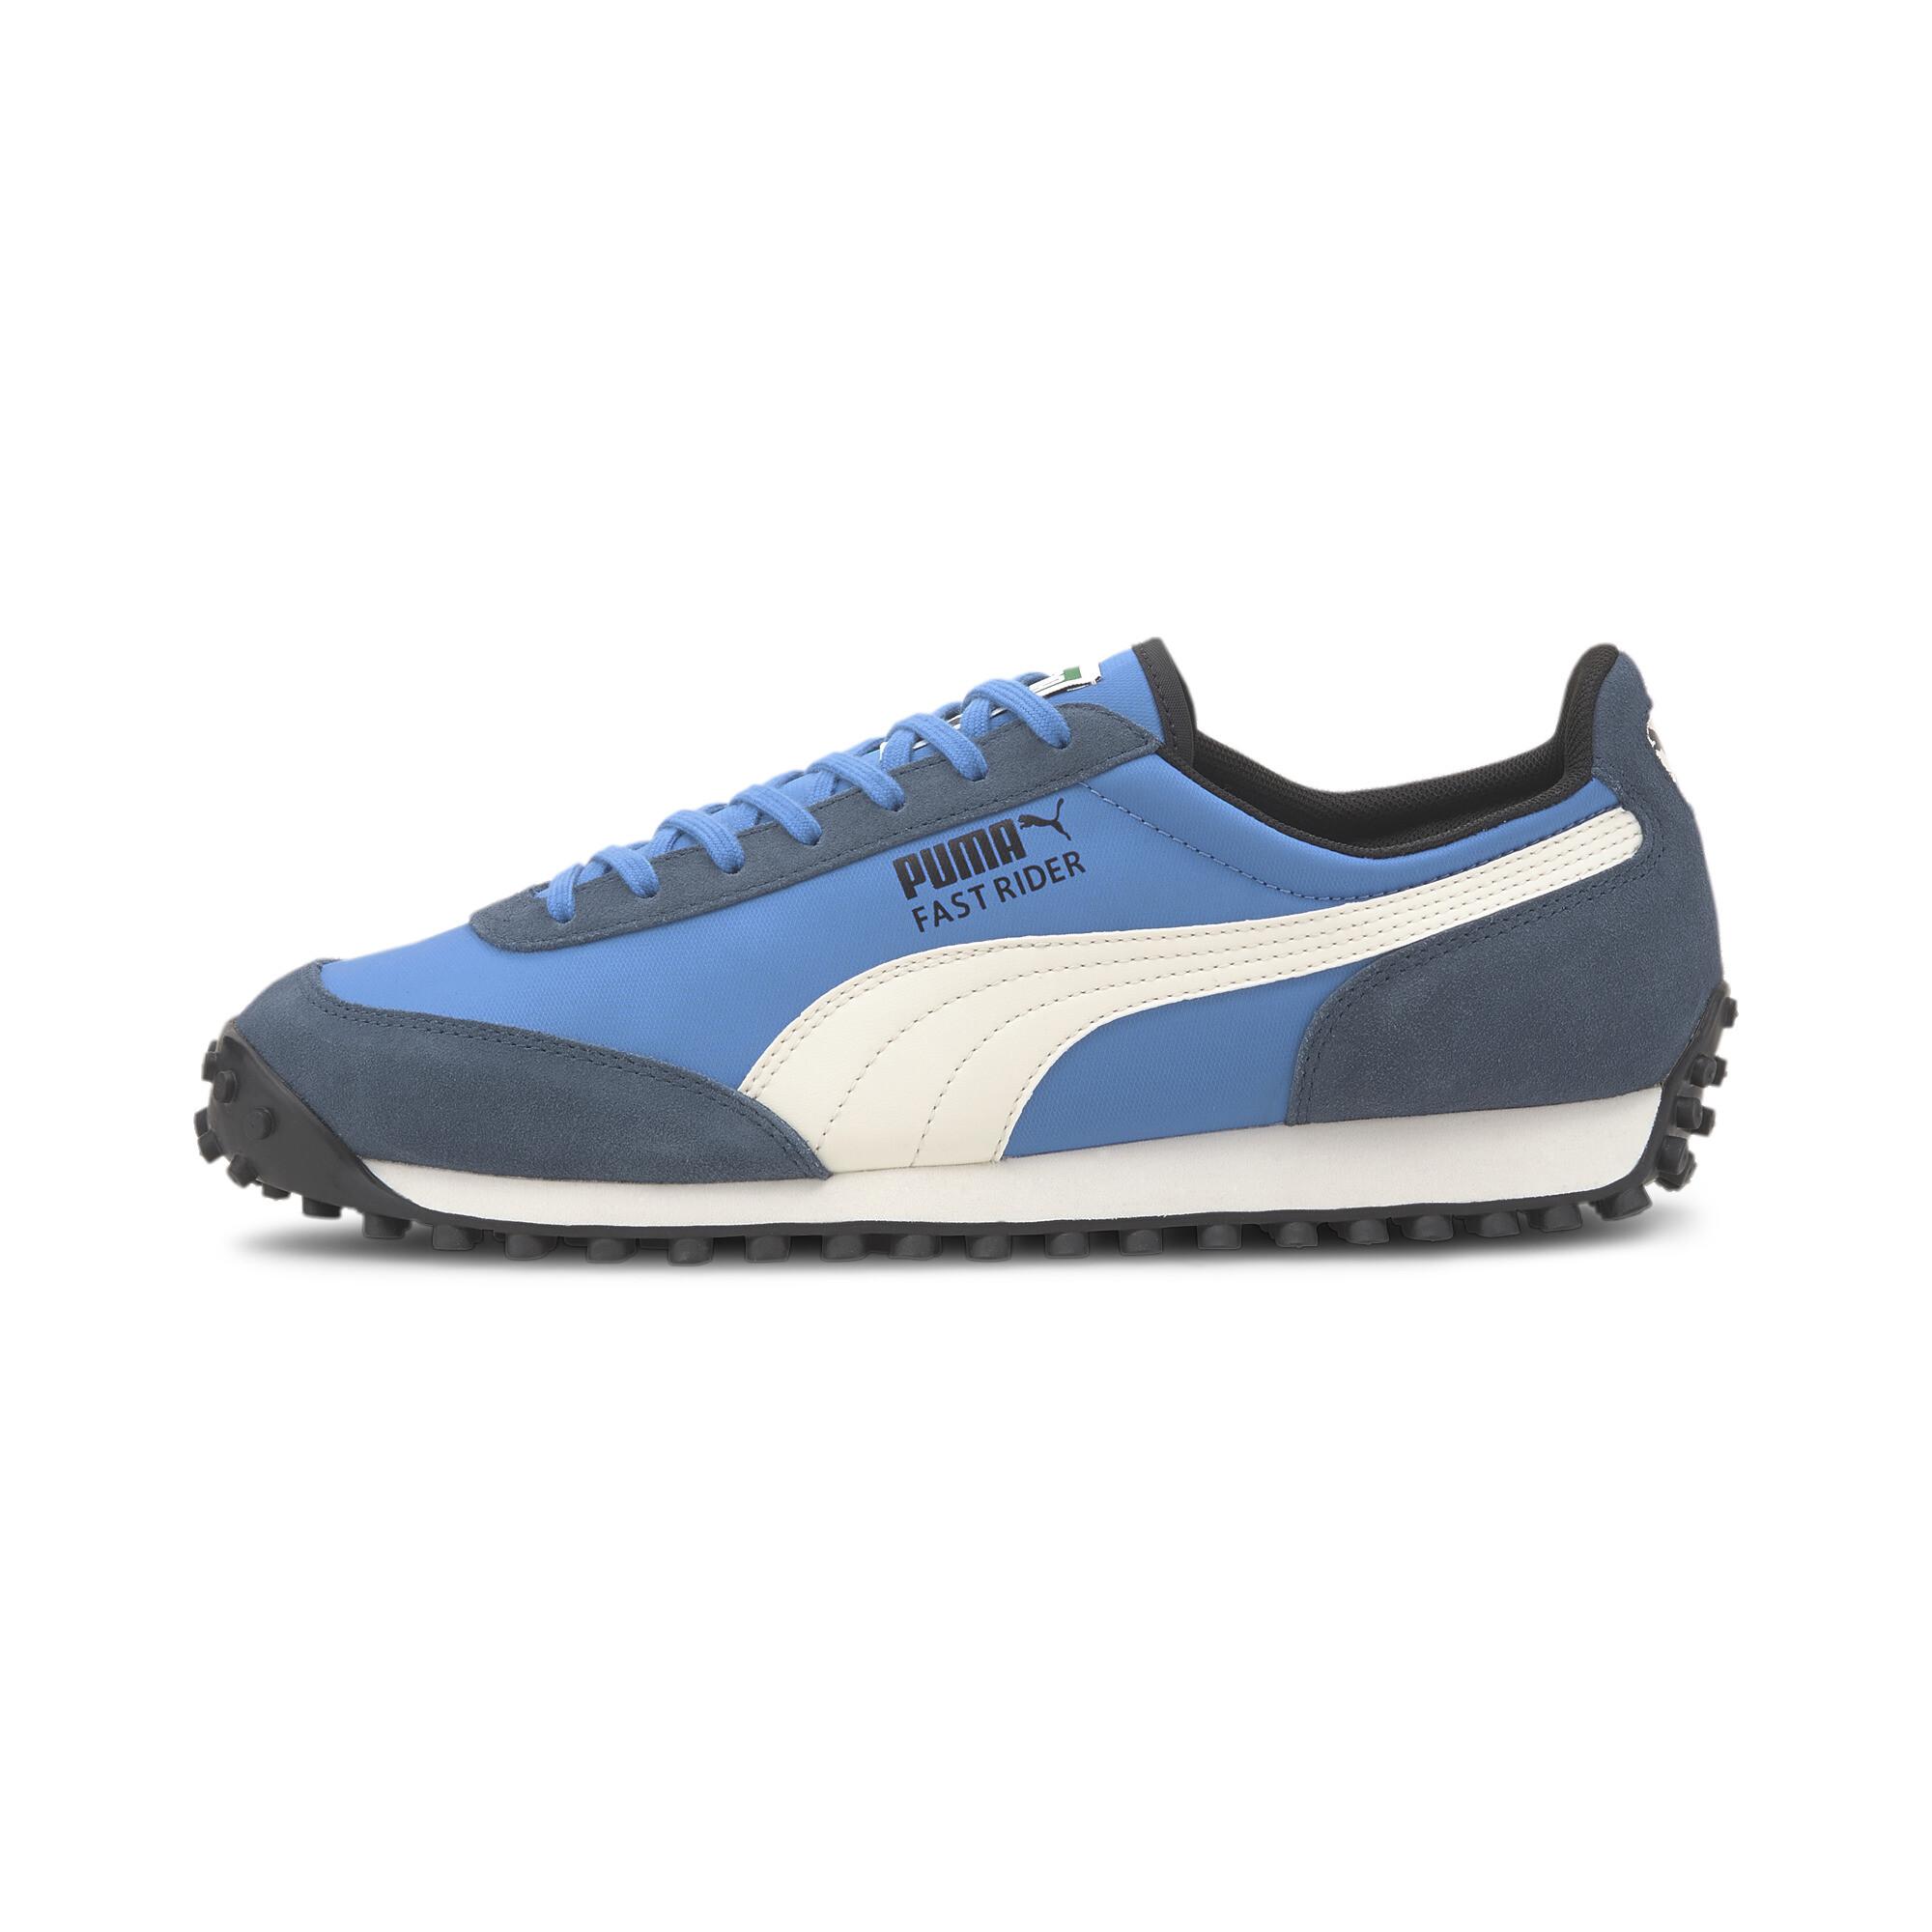 PUMA-Men-039-s-Fast-Rider-Source-Sneakers thumbnail 4